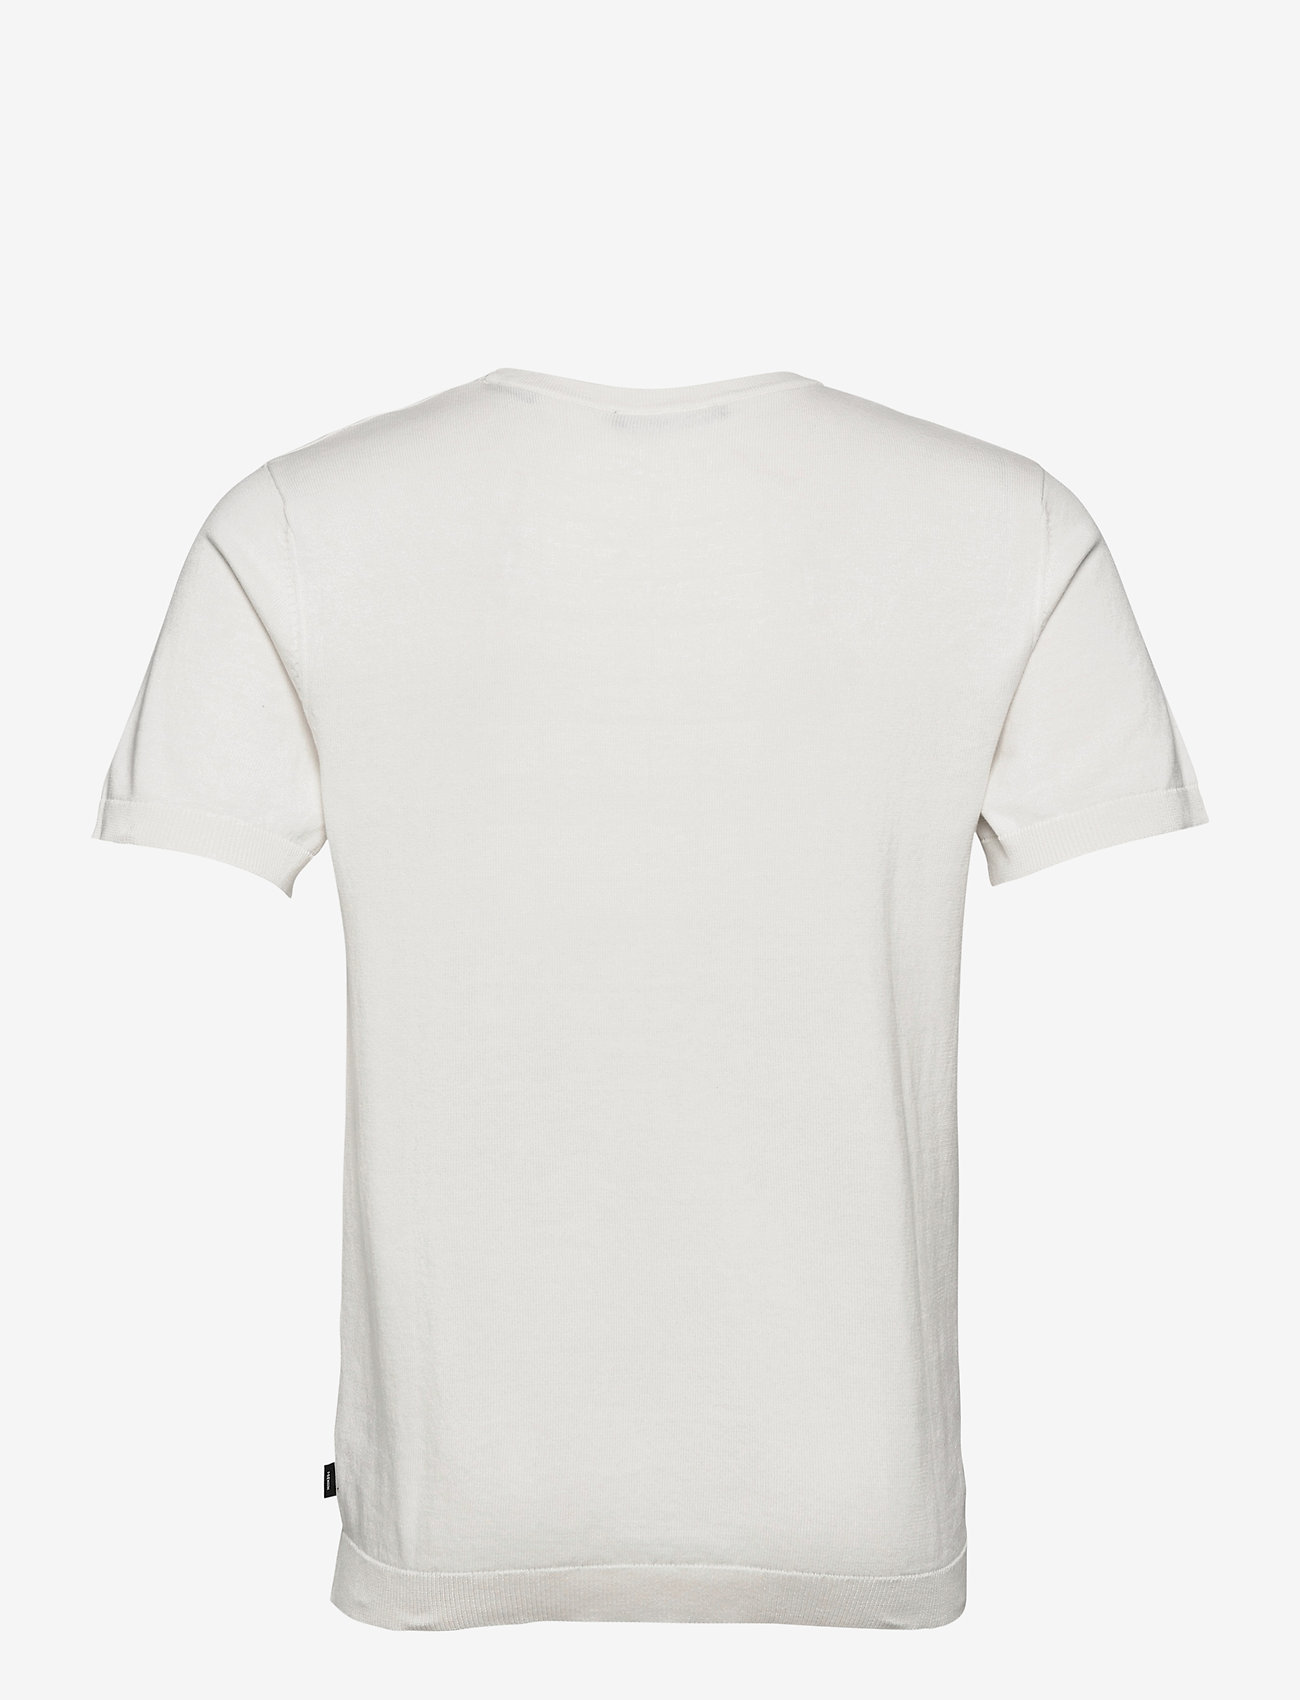 Jack & Jones - JPRBLAIGOR KNIT SS - basic t-shirts - egret - 1